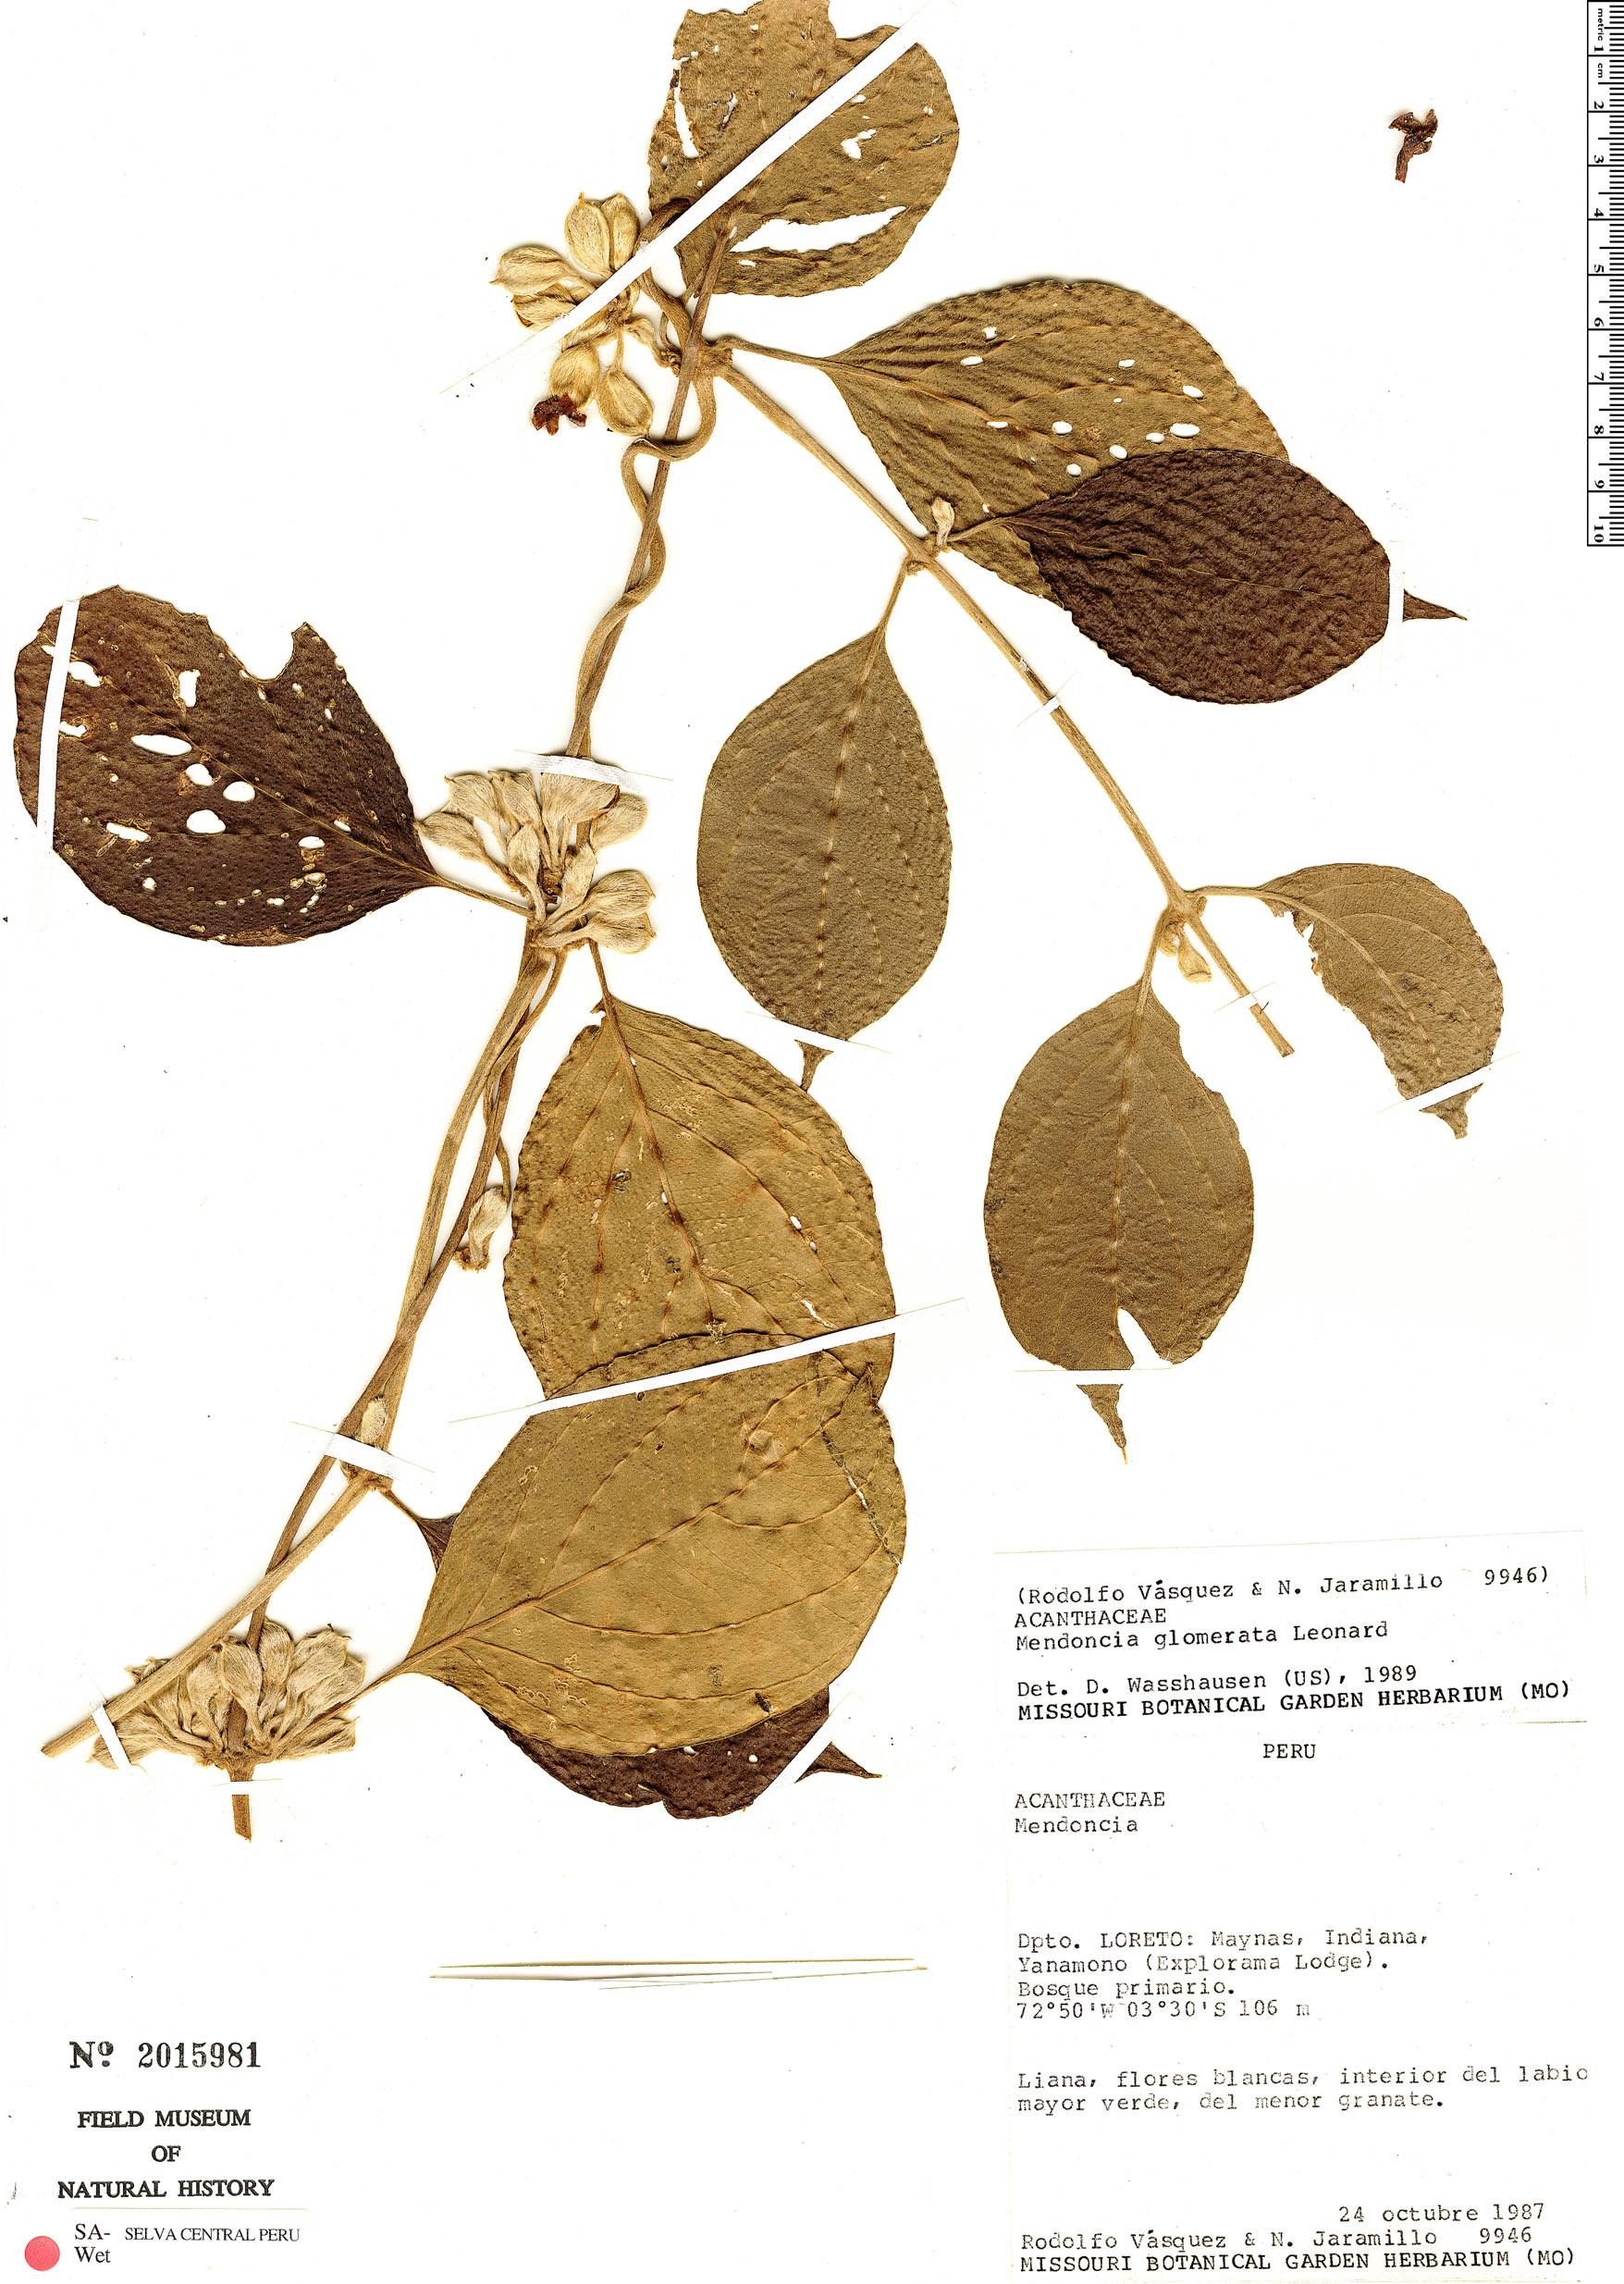 Espécimen: Mendoncia glomerata